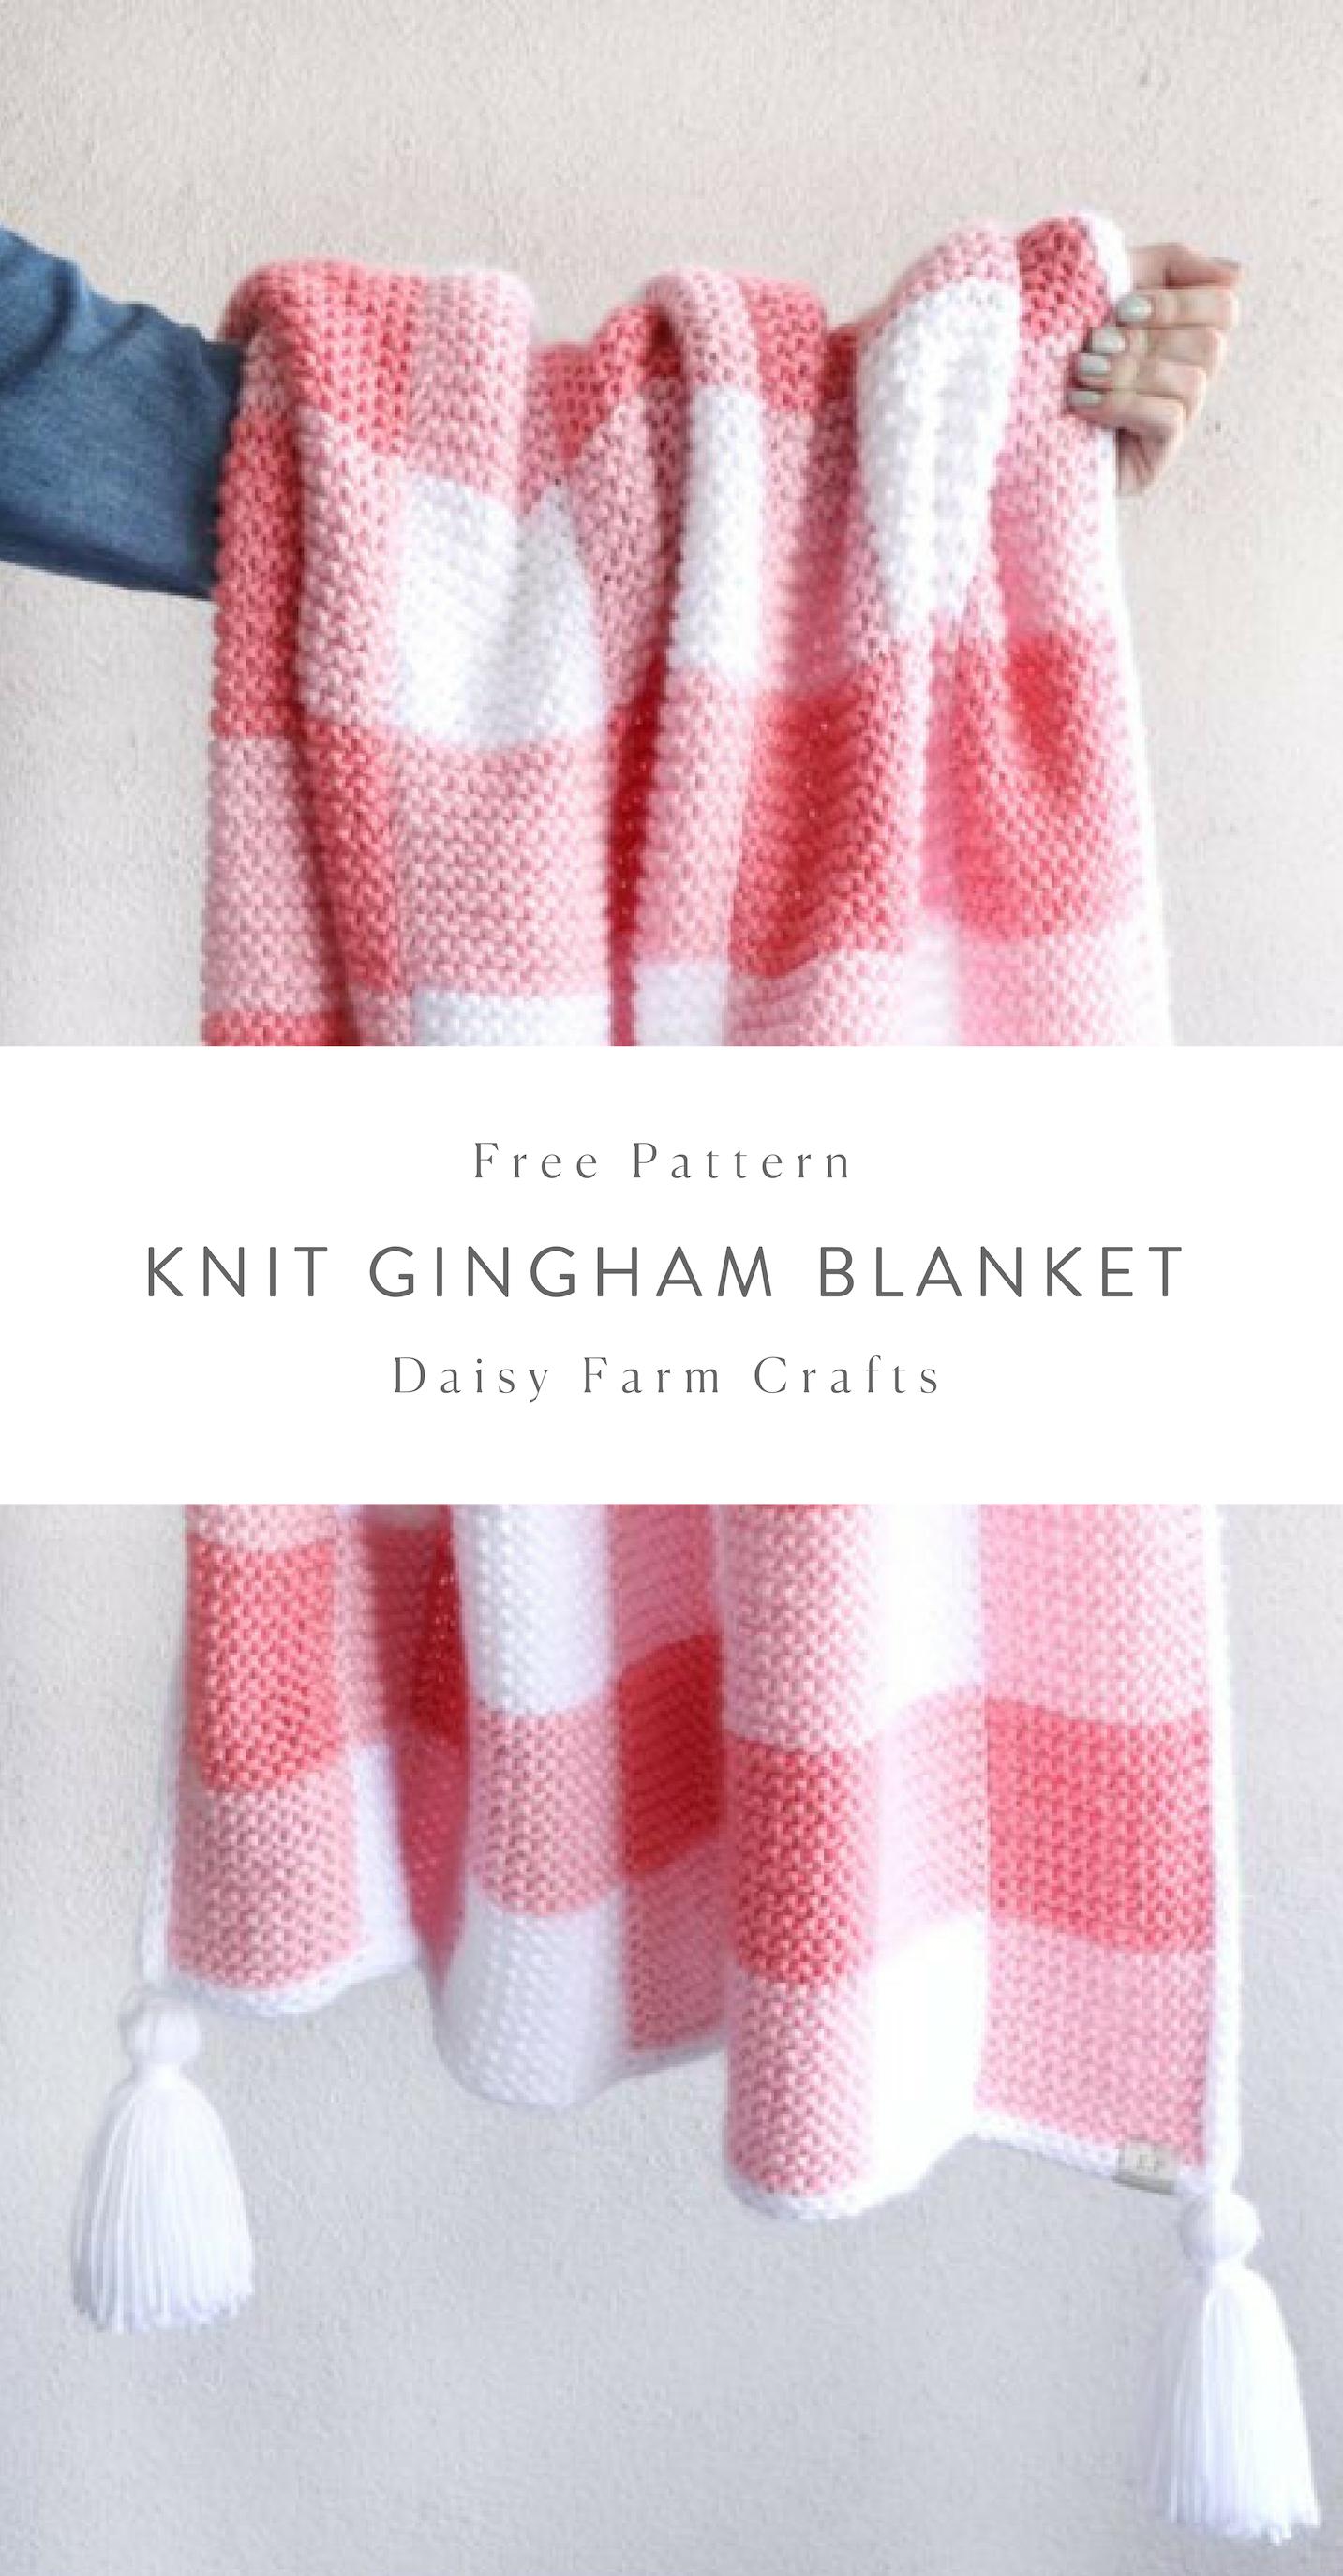 Free Pattern - Knit Gingham Blanket